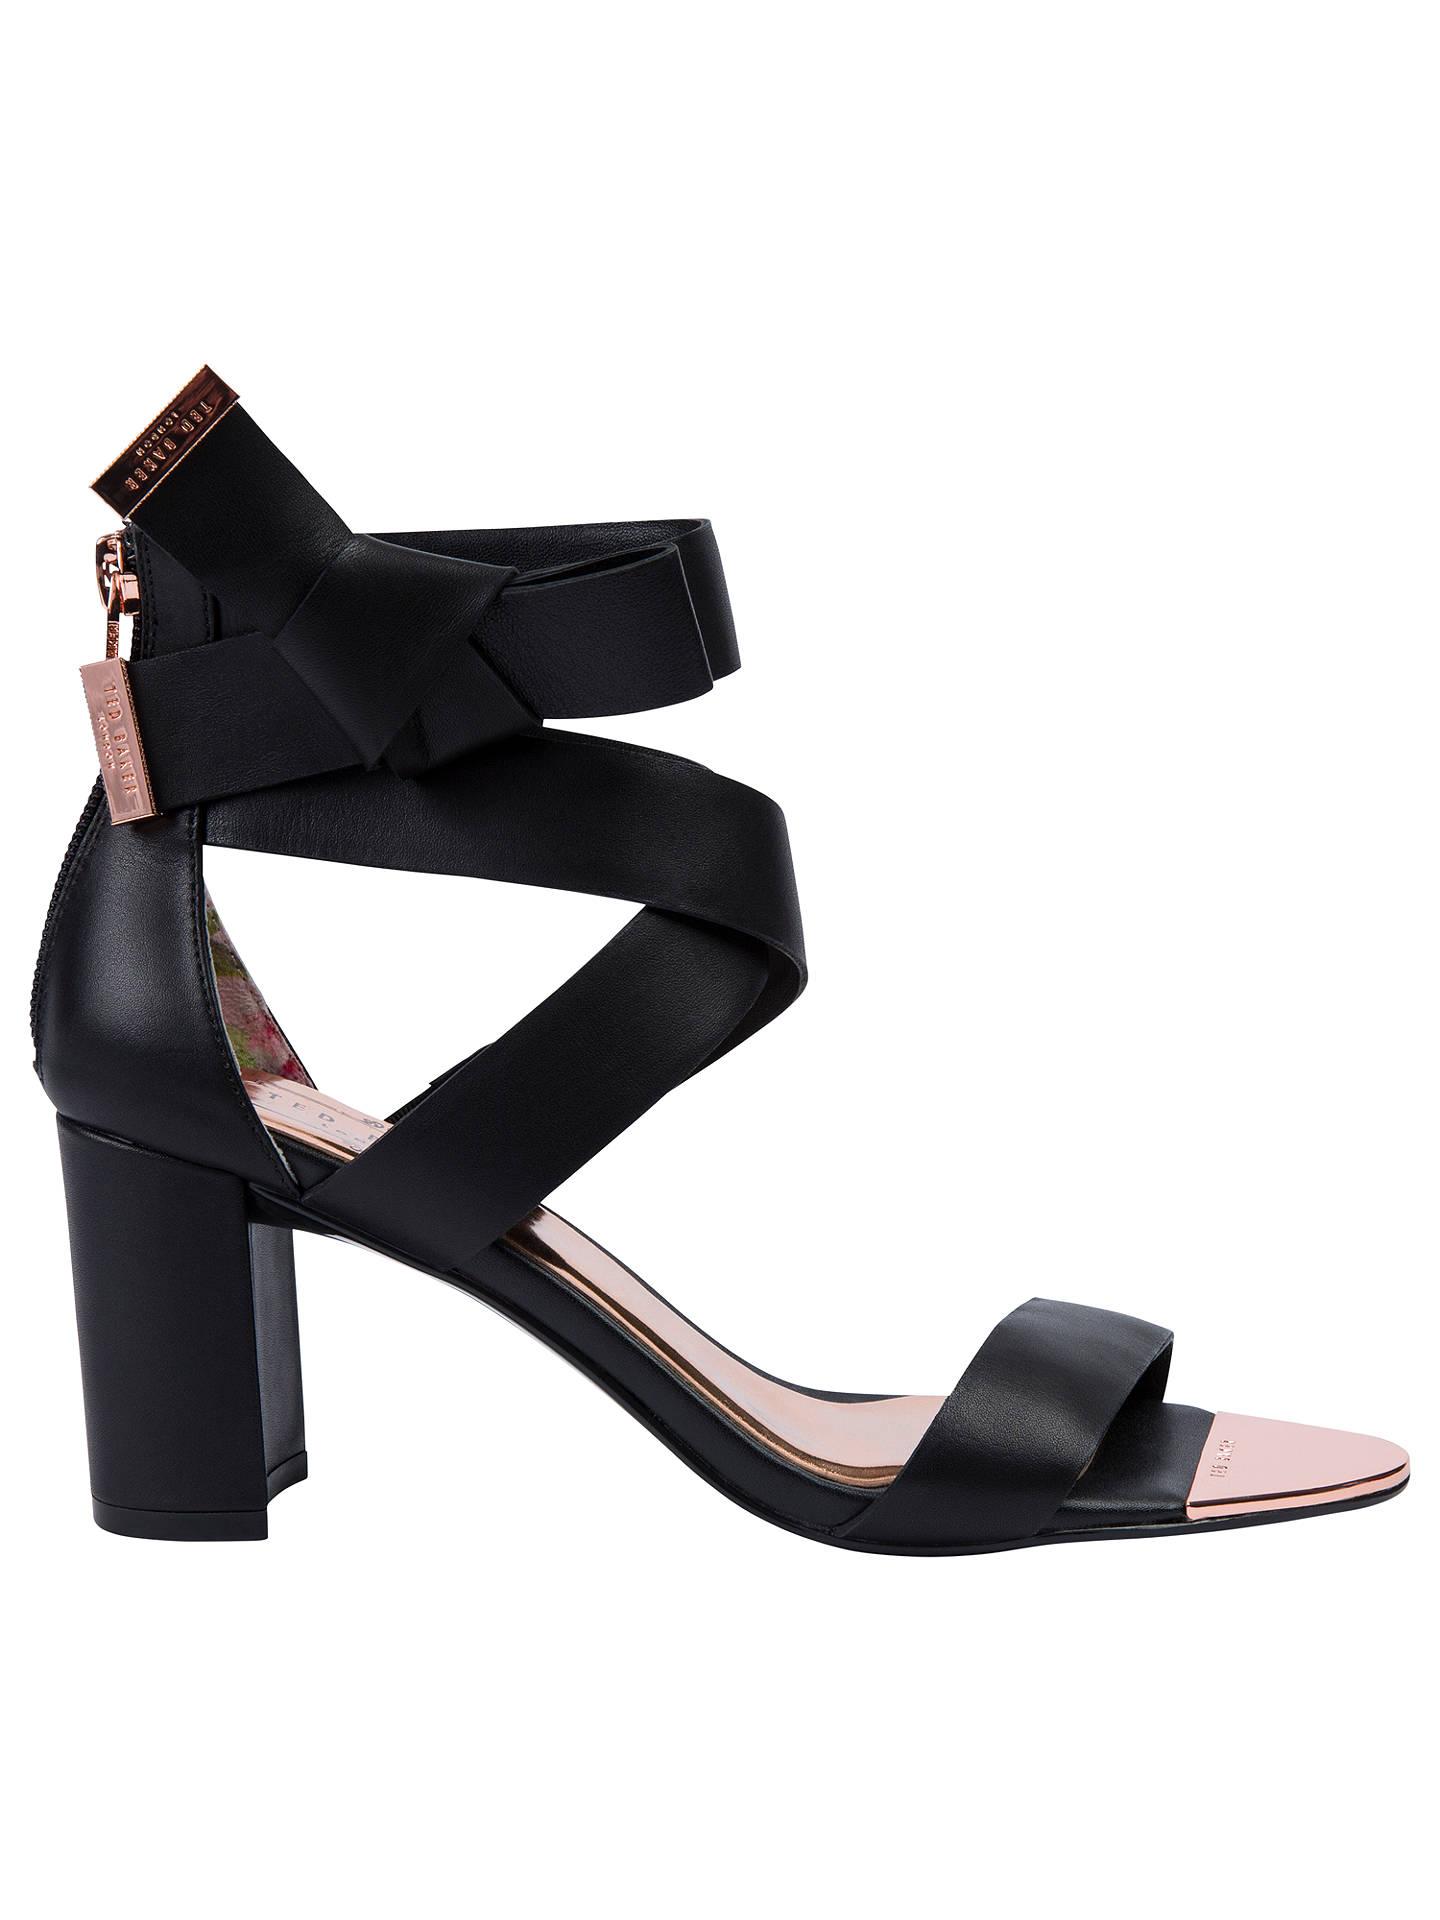 380f25e25 Buy Ted Baker Peyepa Block Heel Sandals